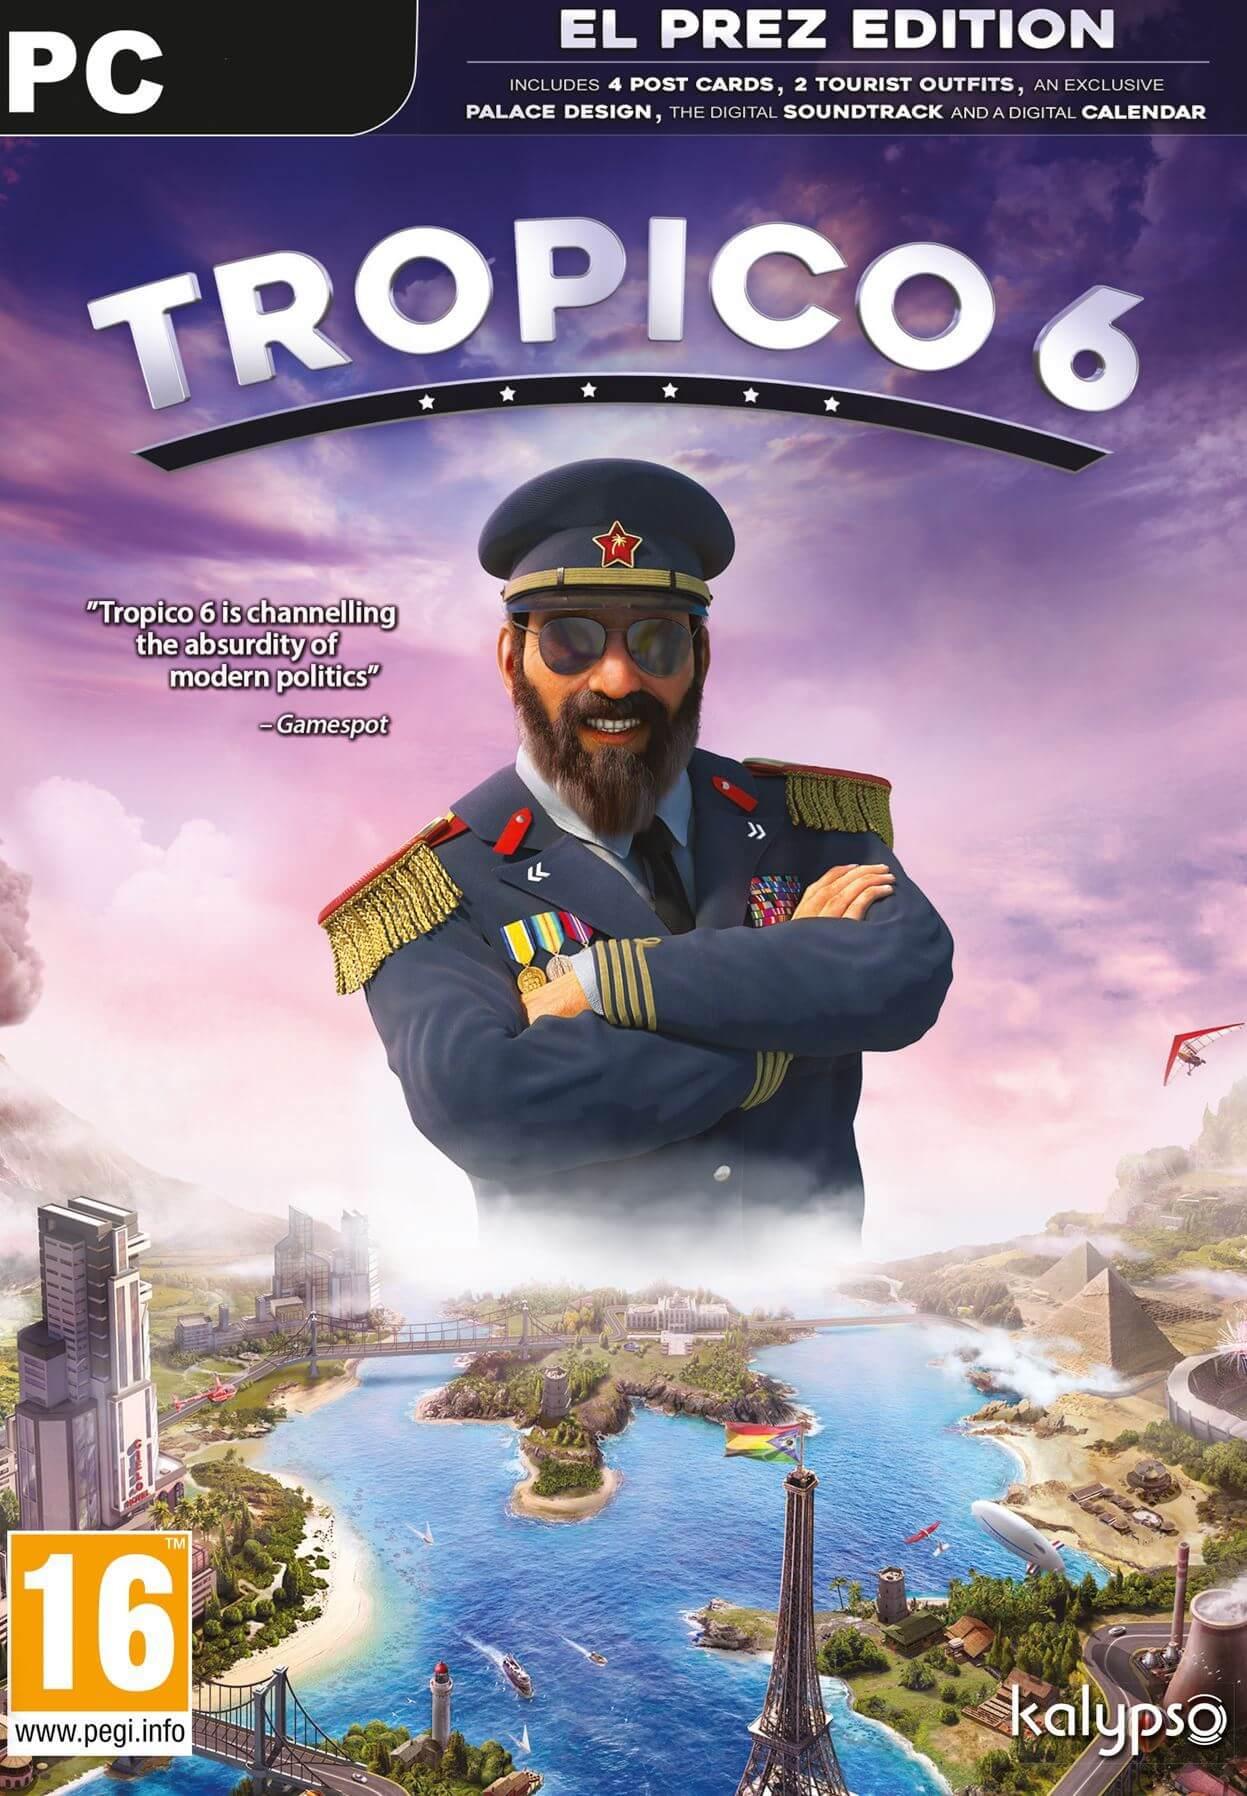 Picture of Tropico 6 El Prez Edition Pre-Order